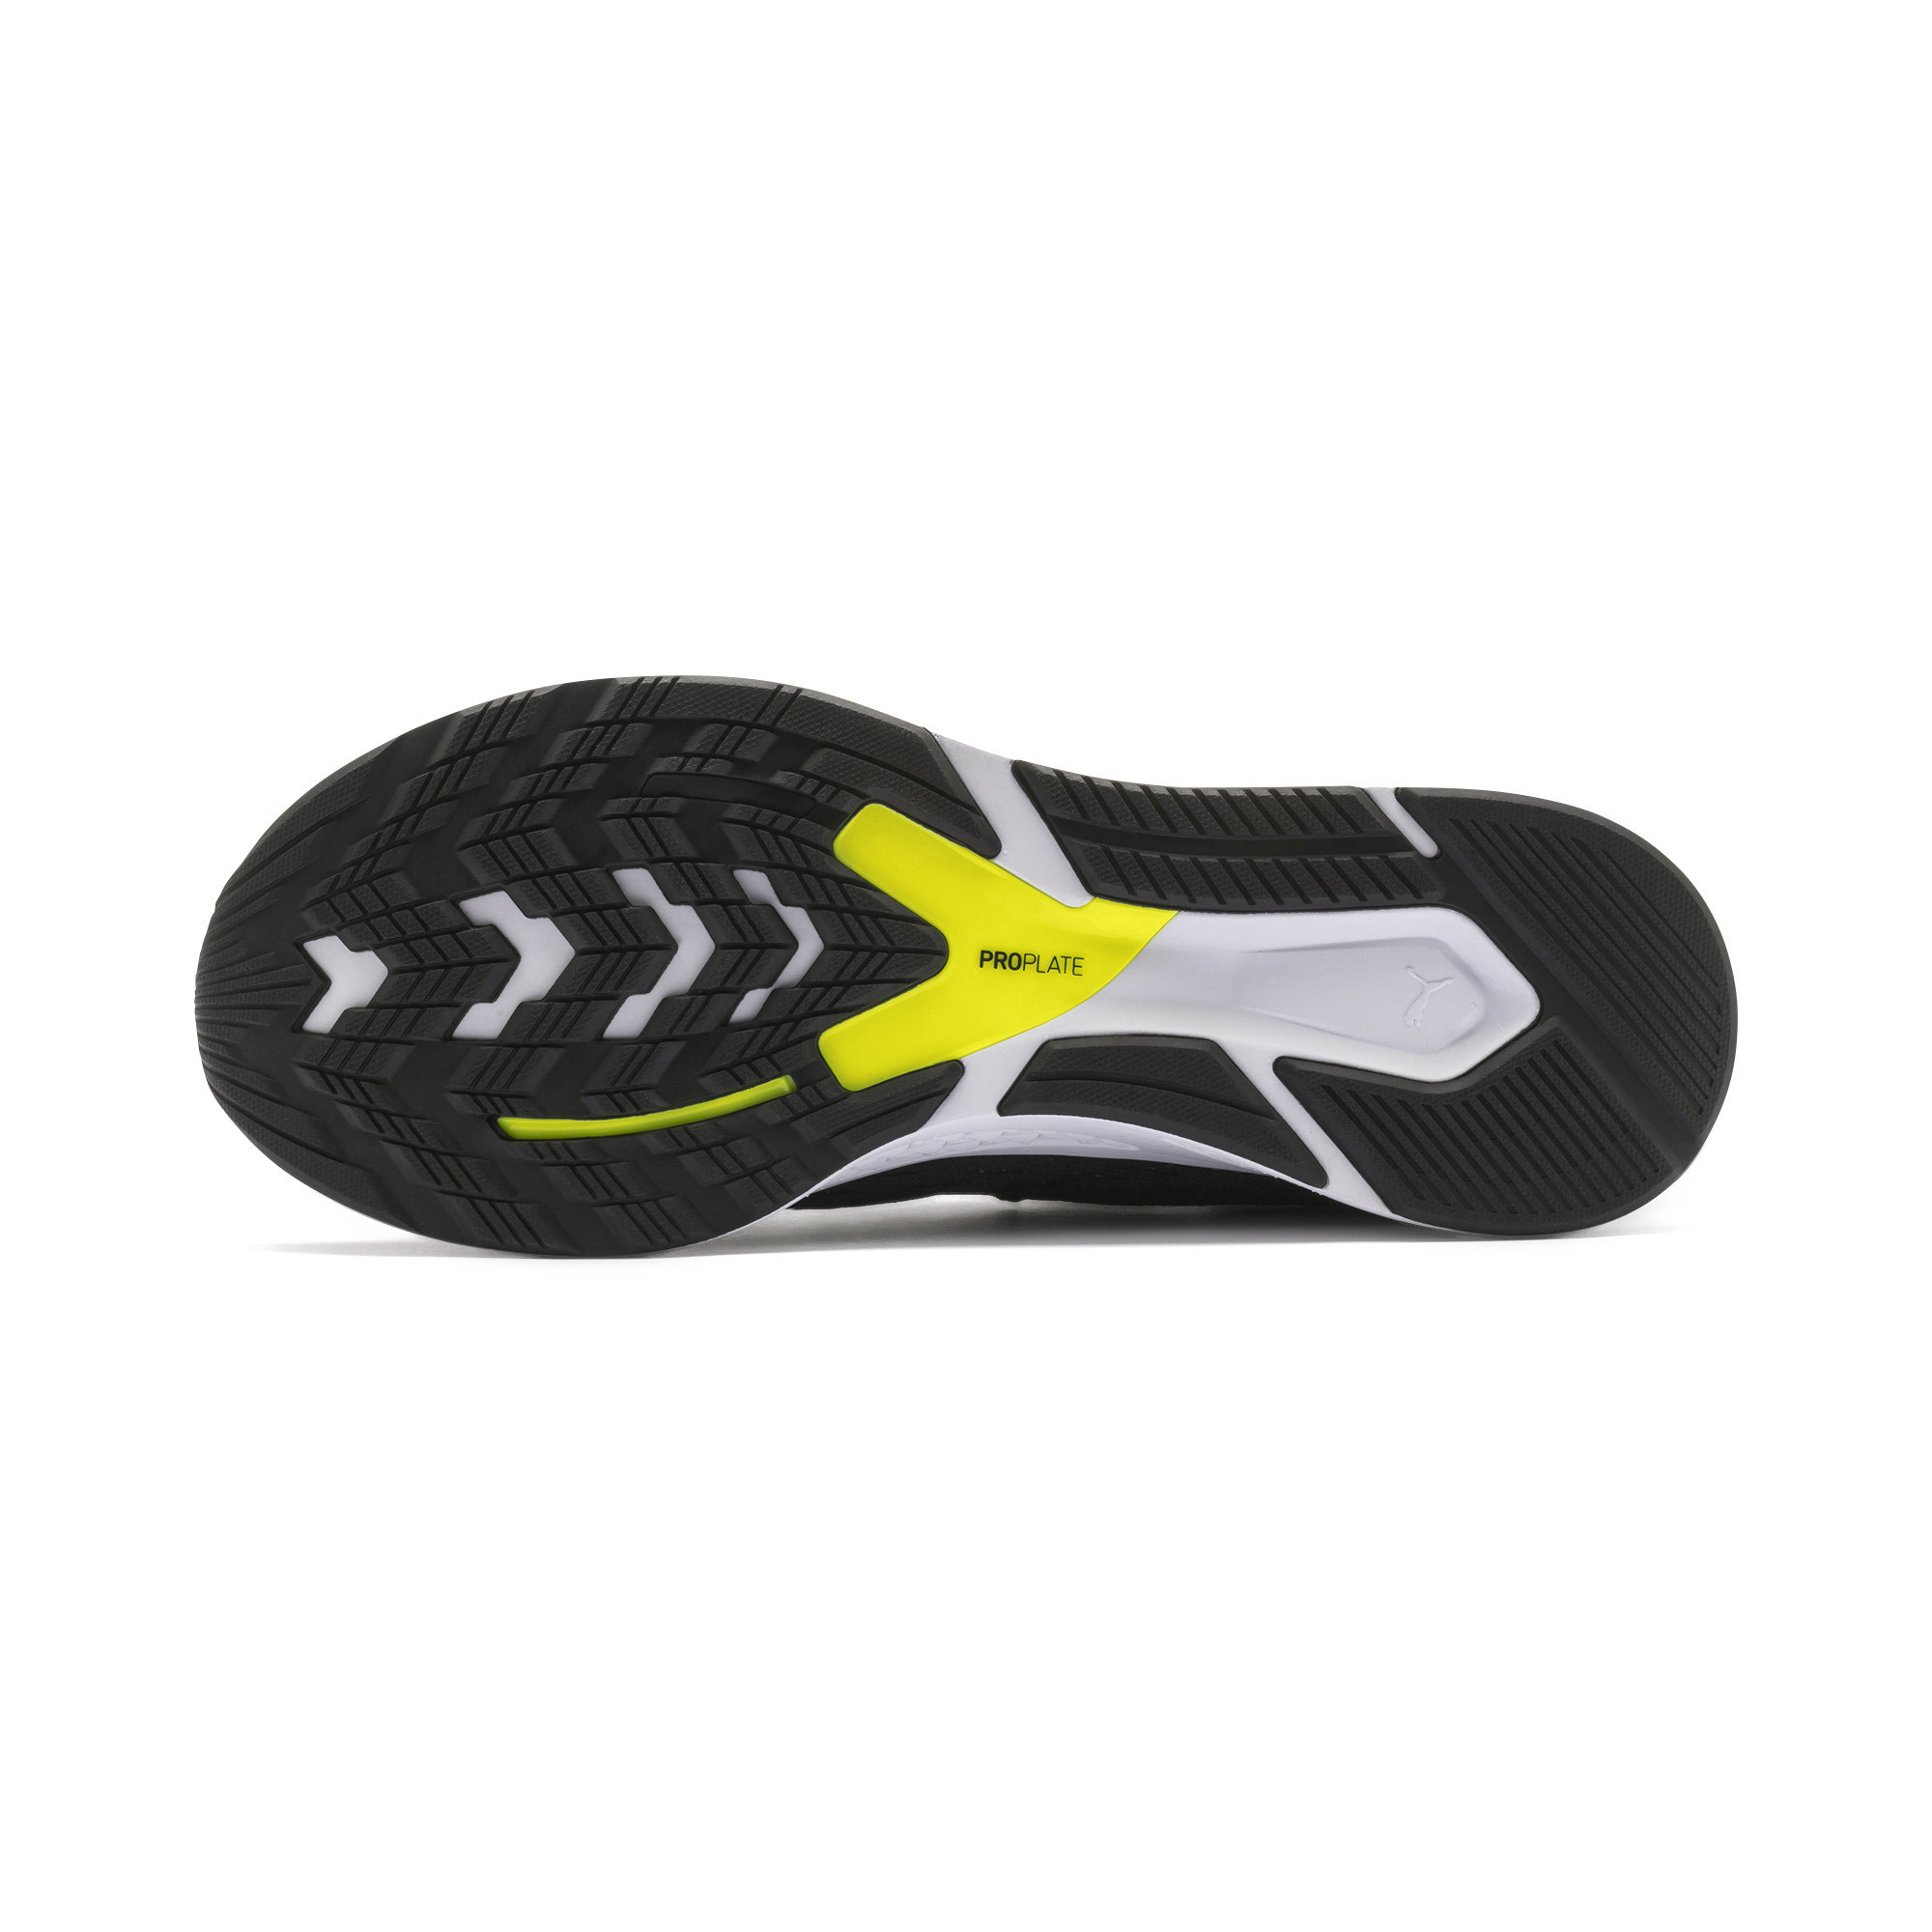 PUMA-SPEED-500-Men-039-s-Running-Shoes-Men-Shoe-Running thumbnail 6